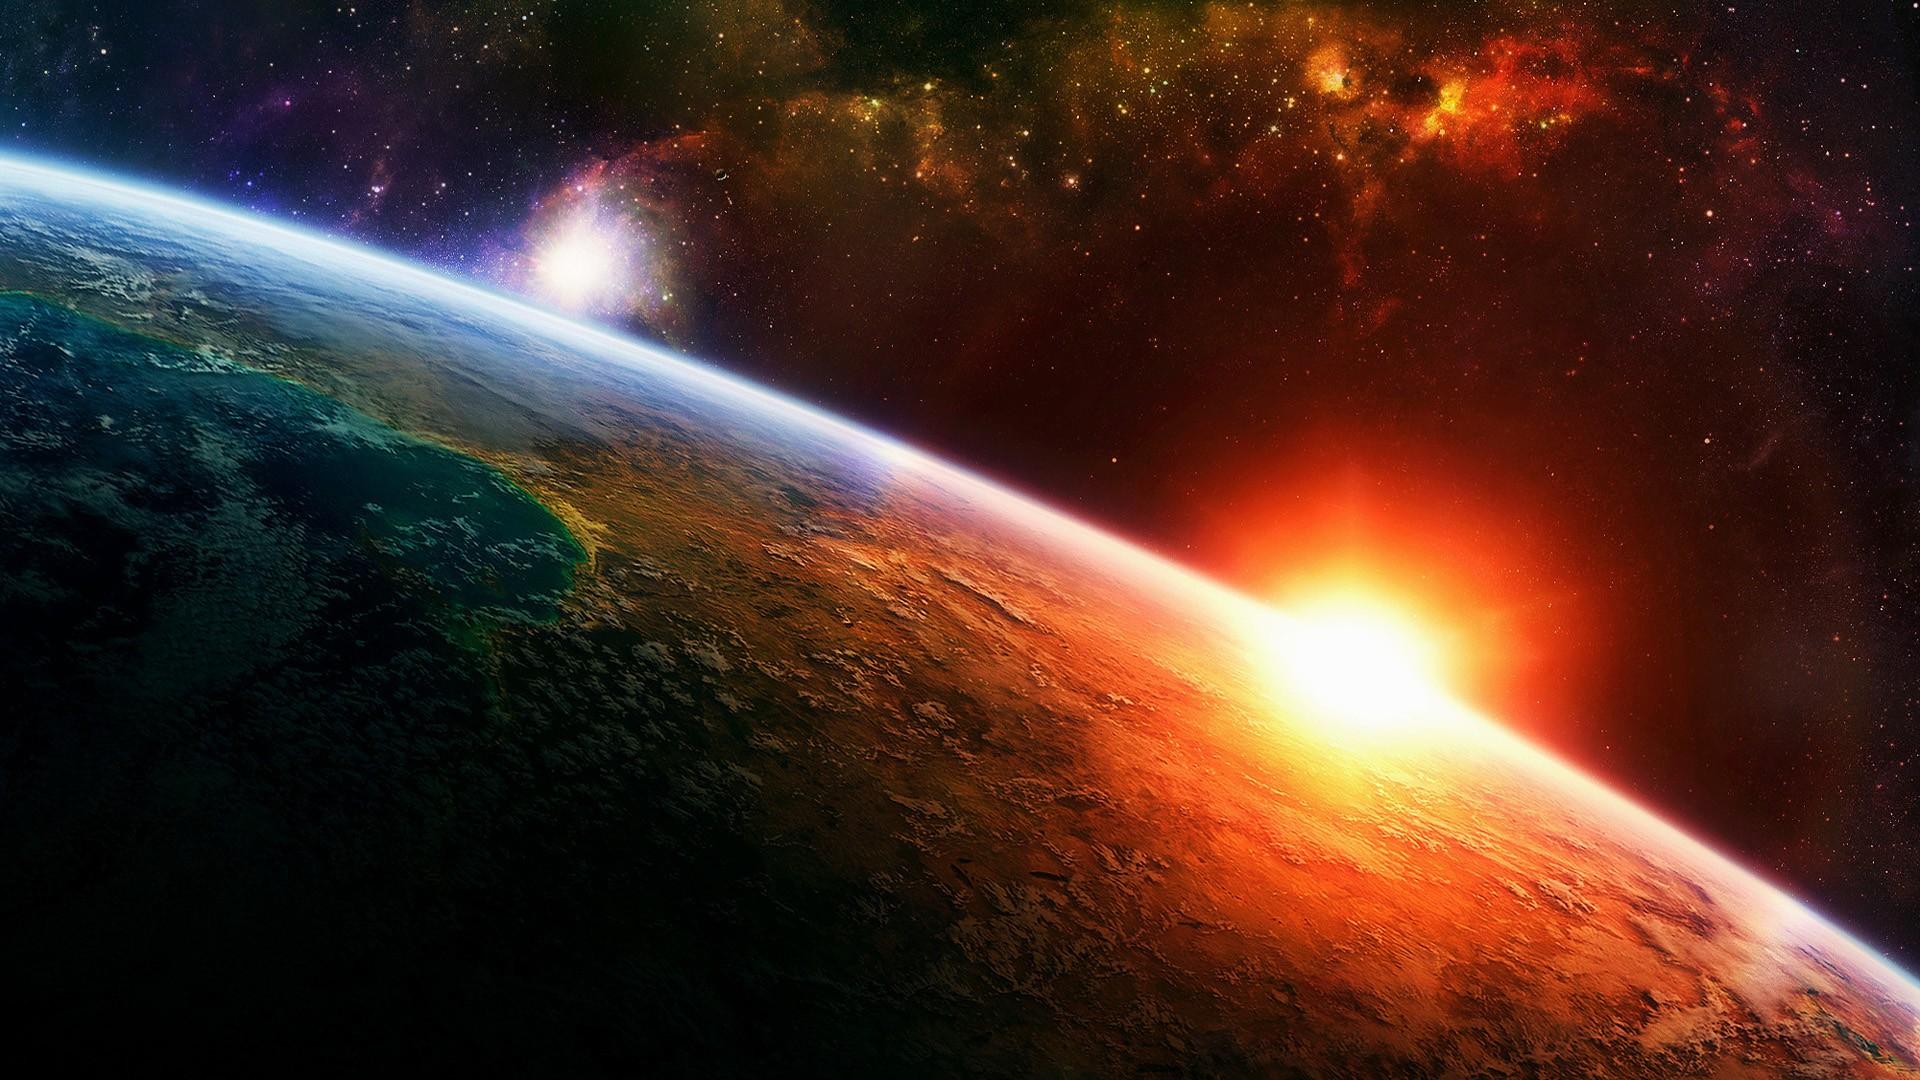 Wallpaper Digital Art Planet Sky Earth Space Art